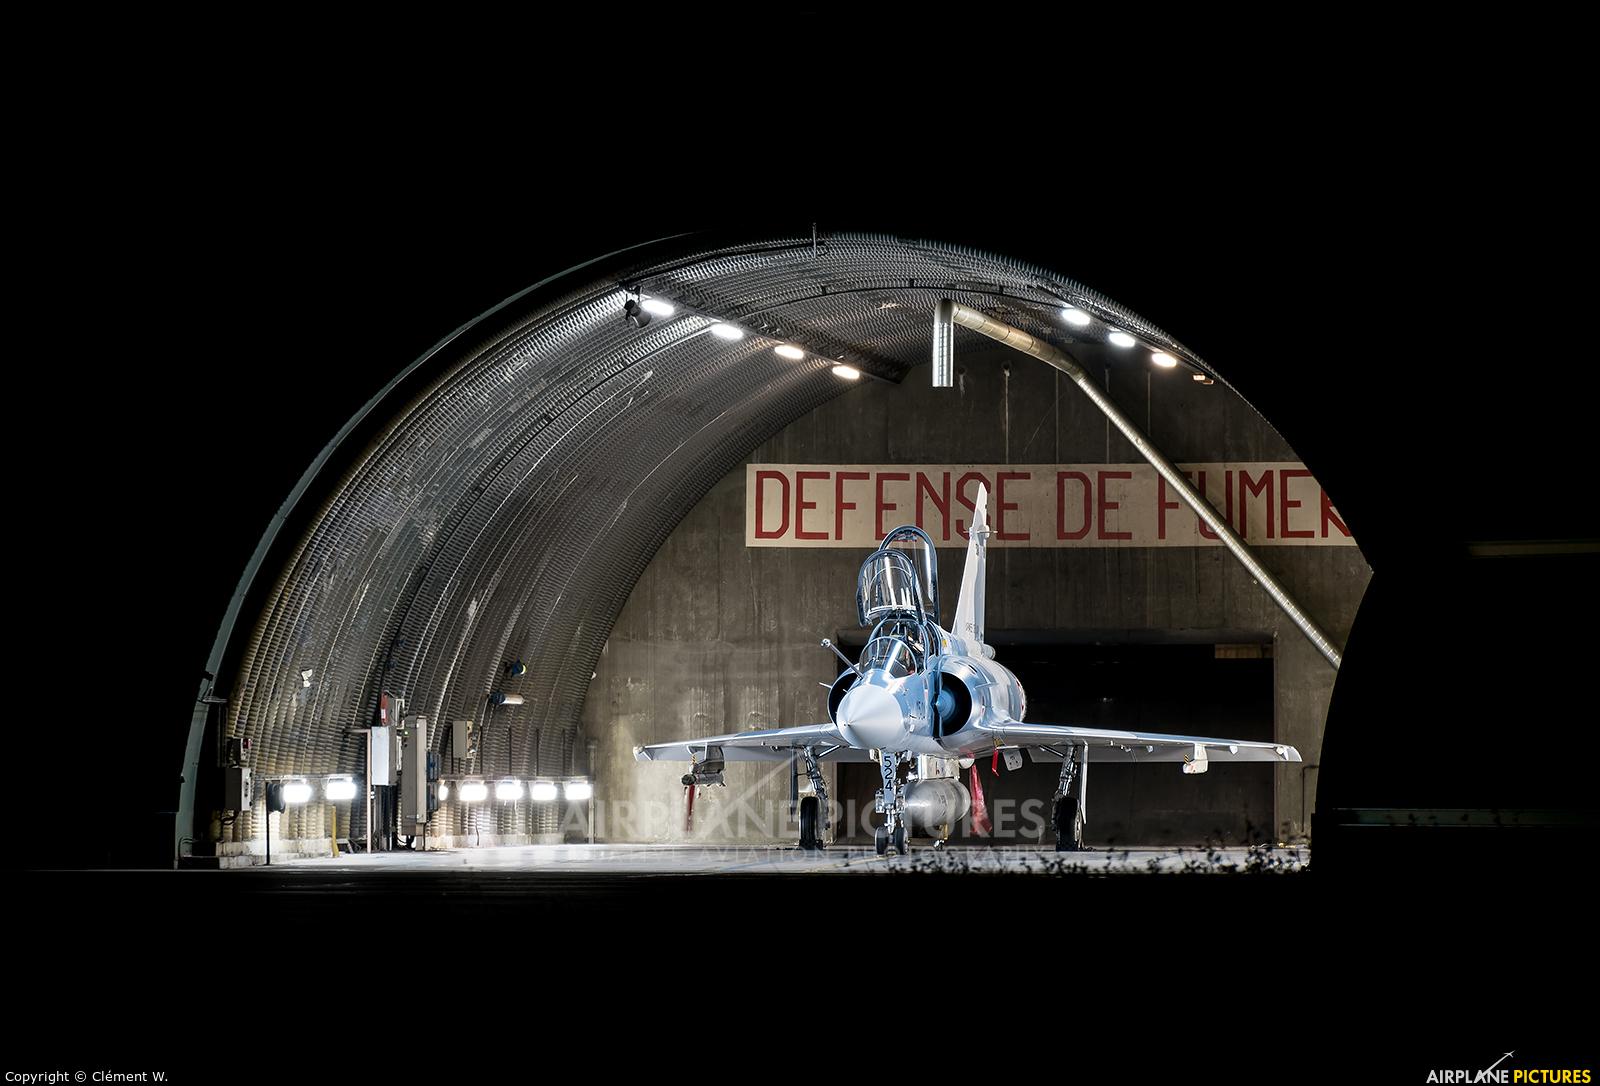 France - Air Force 115-YE aircraft at Orange - Caritat